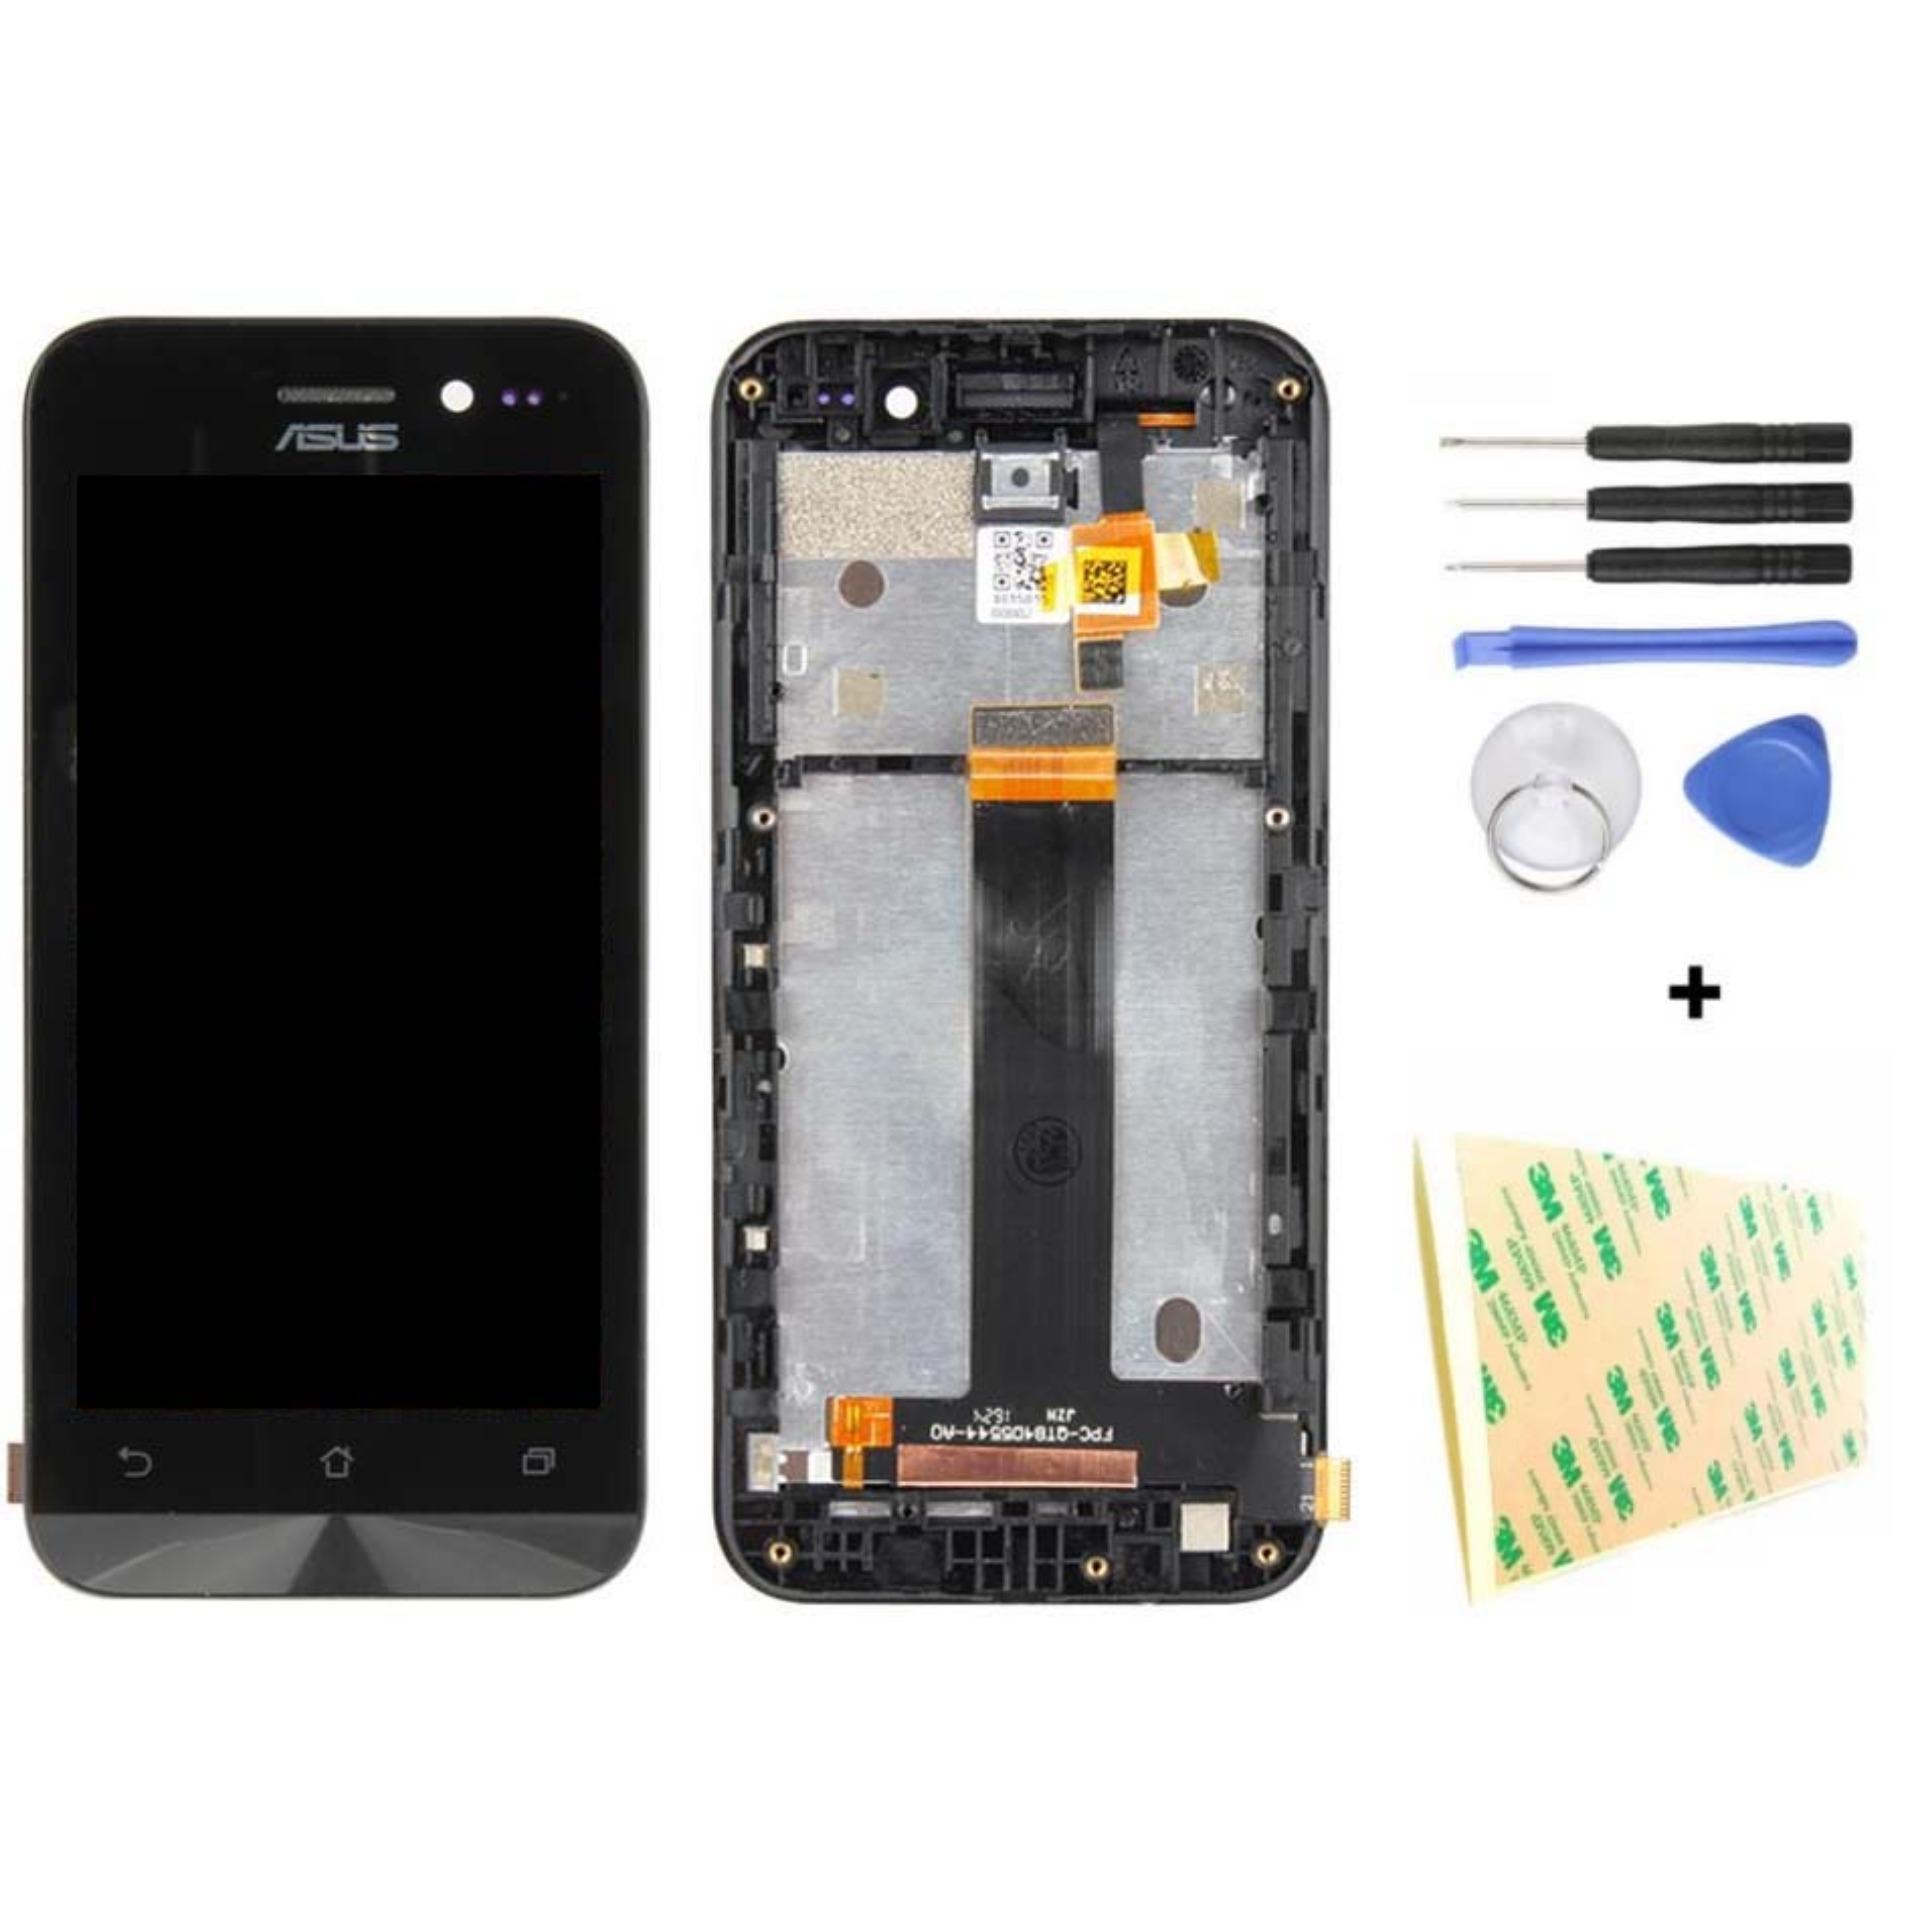 Untuk Asus Zenfone Go ZB452KG X014D Hitam 4.5 Inch Penuh Layar LCD + Layar Sentuh Perakitan Kaca Digitalizer dengan Bingkai-Internasional